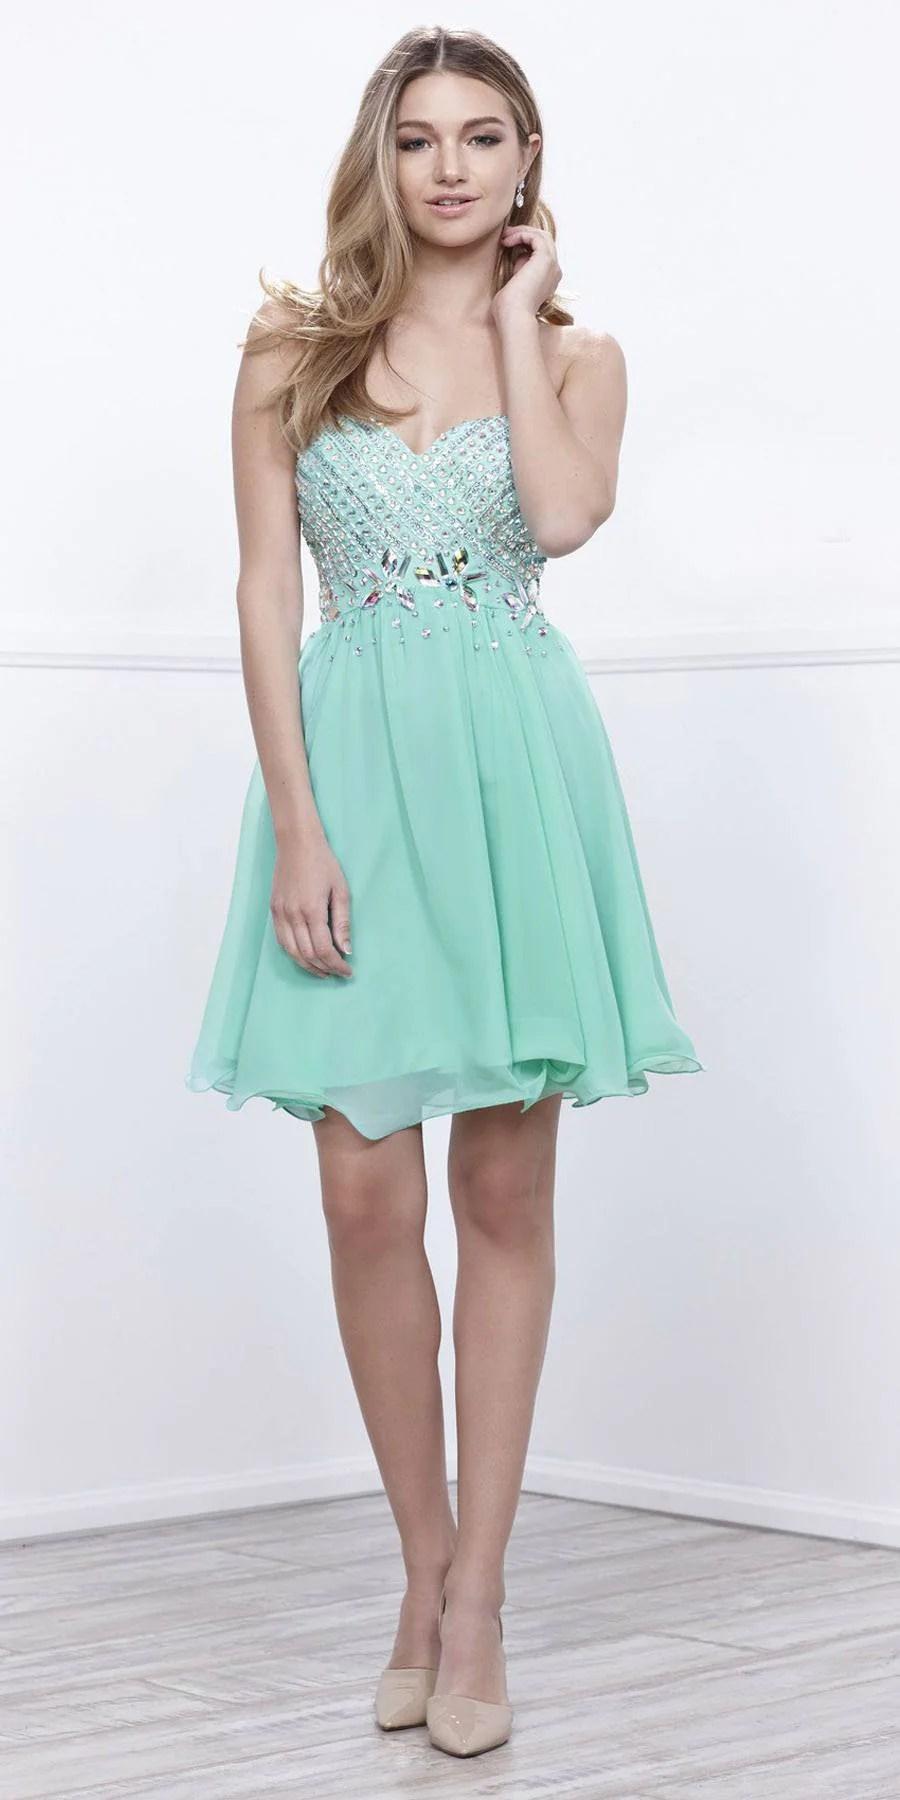 Mint Green Short Homecoming Dresses